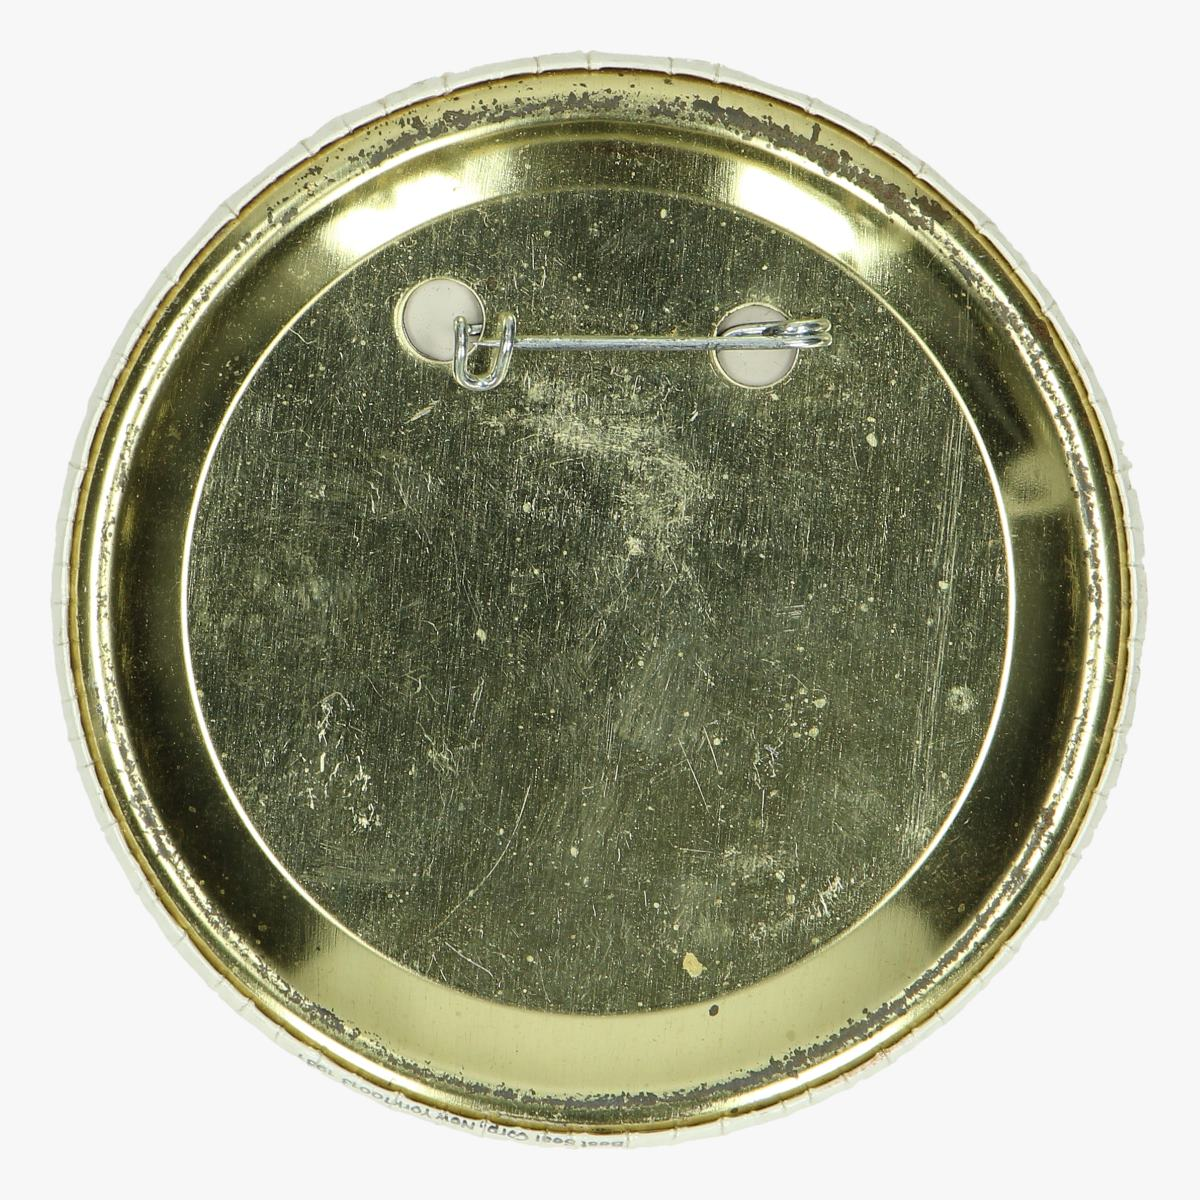 Afbeeldingen van button pins columbia engle-truly Johnson space center 1981